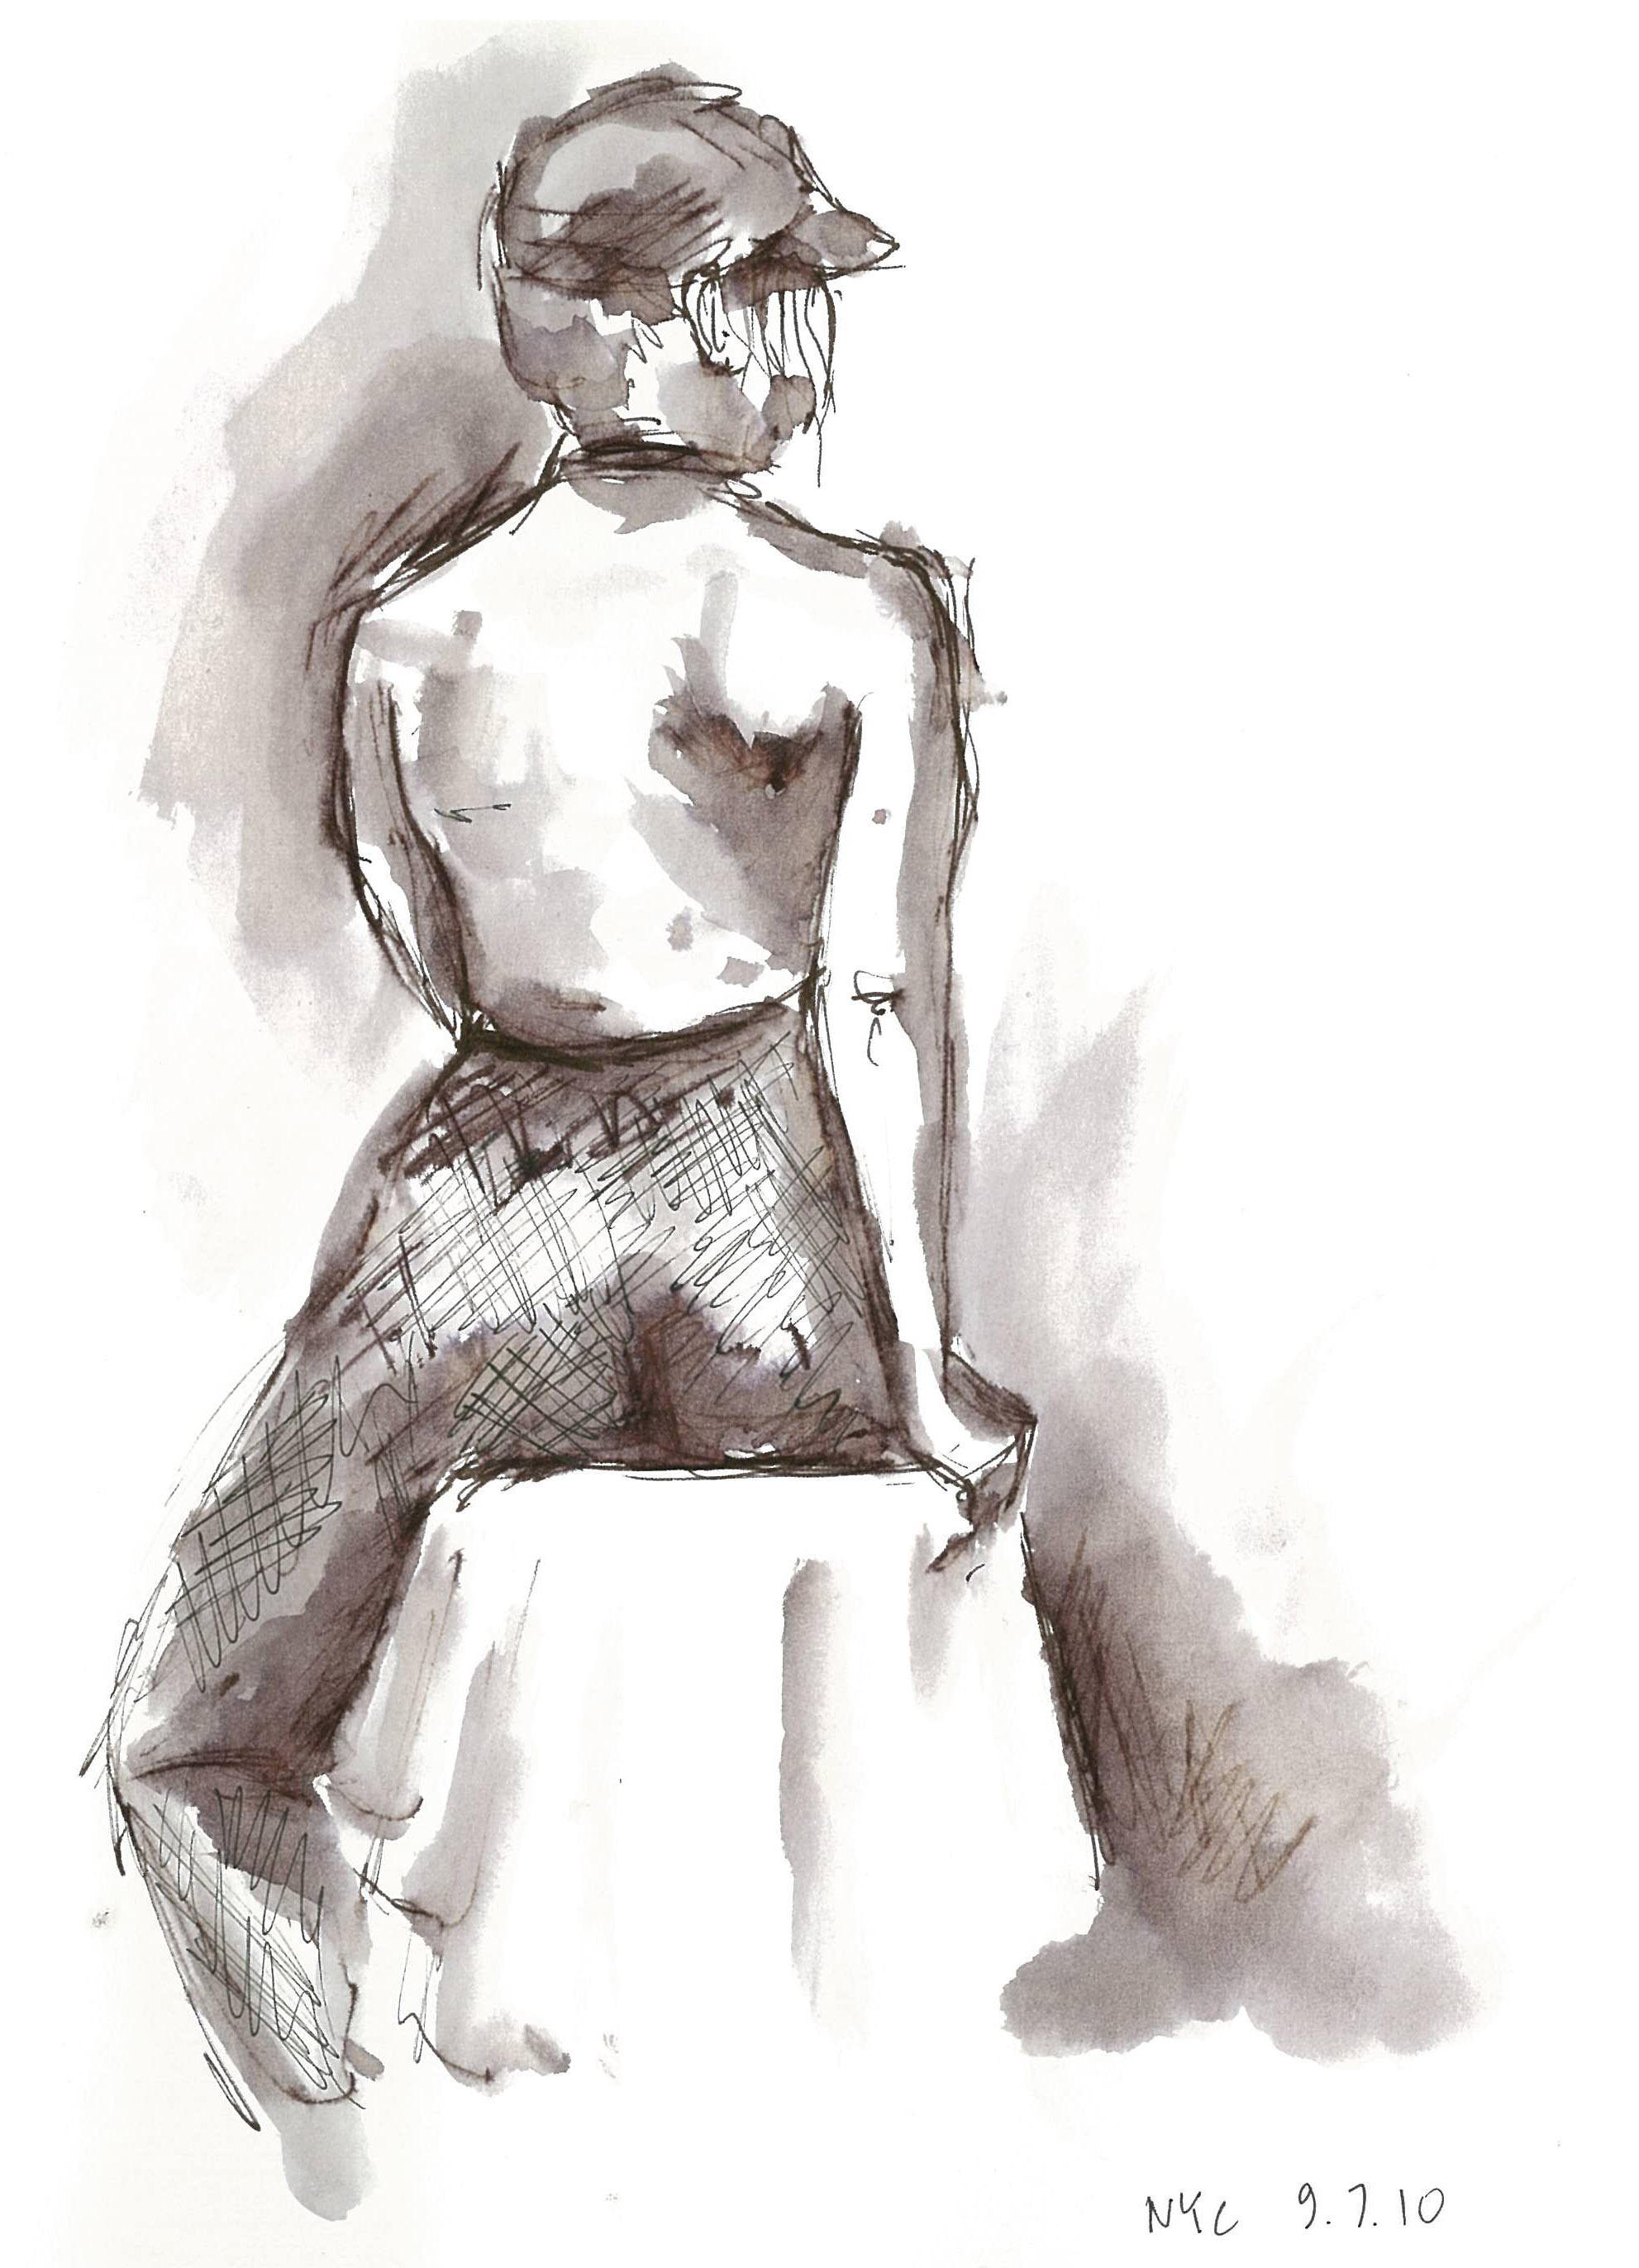 Life Drawing at New York Illustrators Assoc.